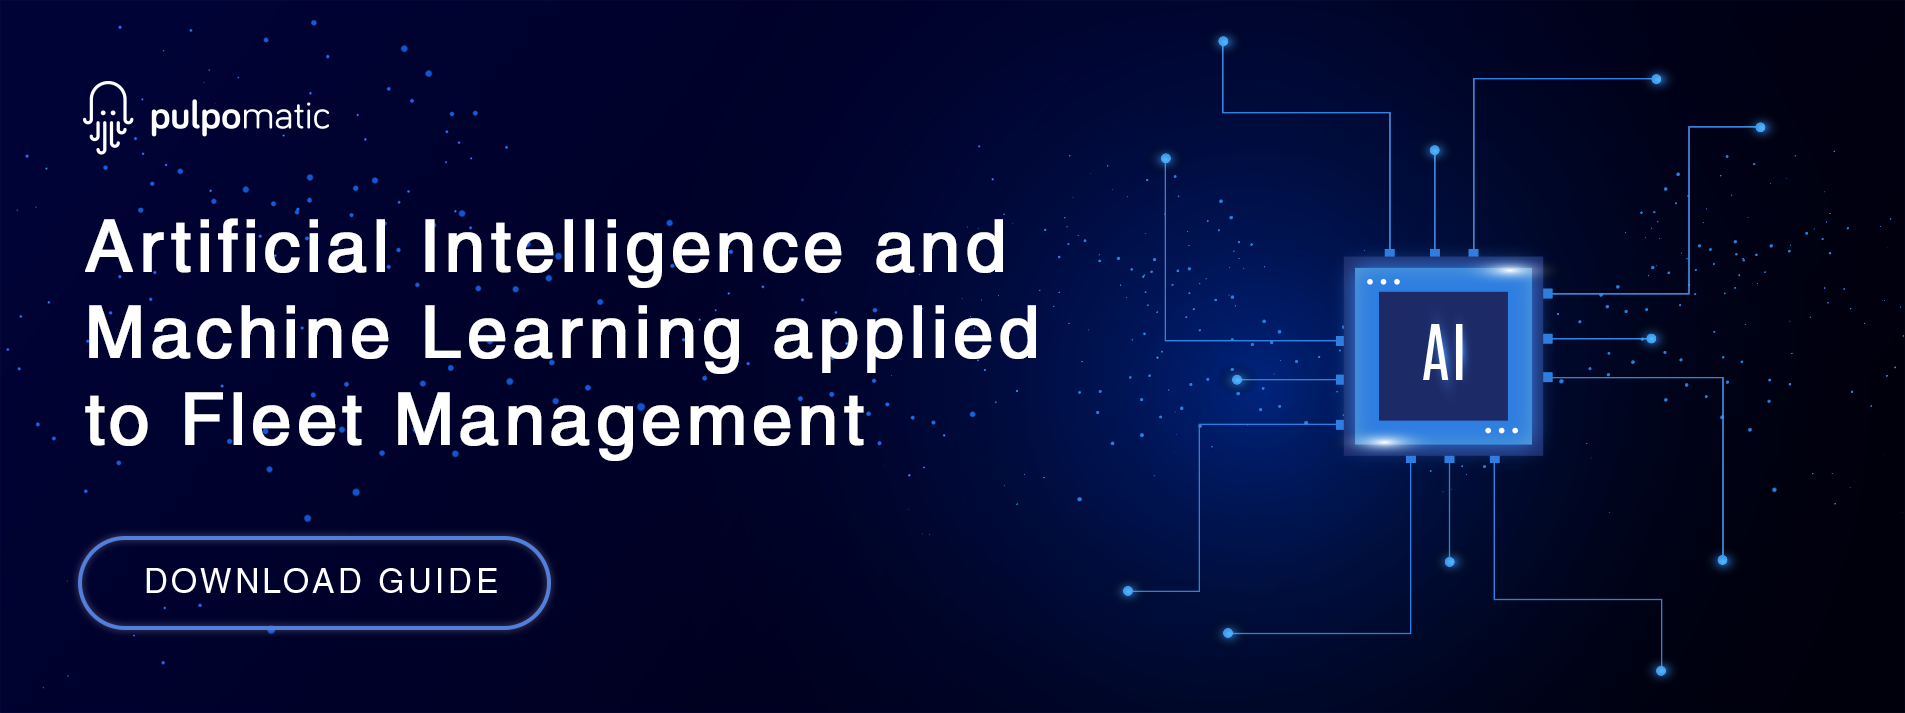 Artificial Intelligence applied to fleet management